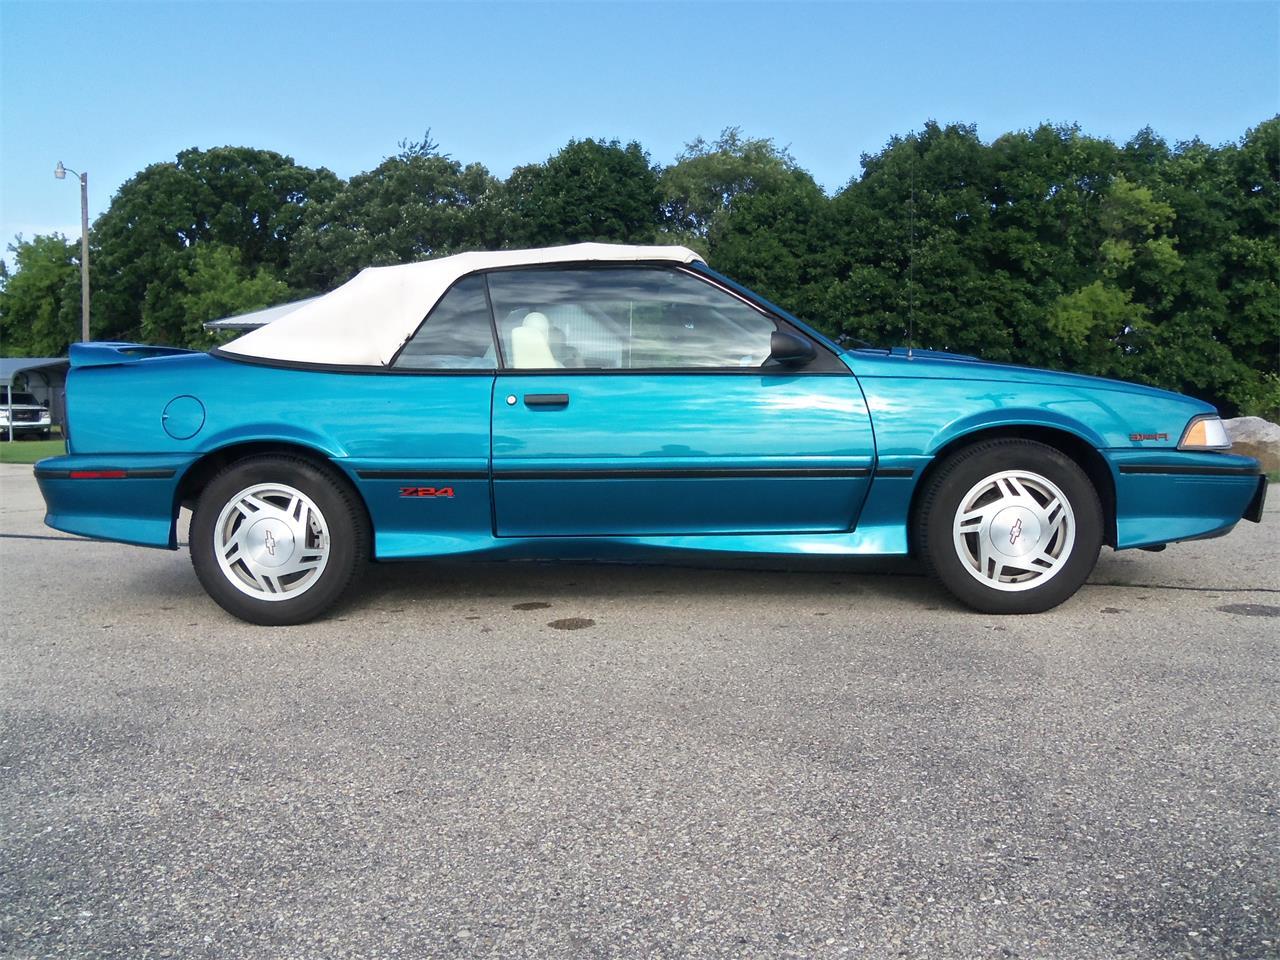 1992 chevrolet cavalier for sale classiccars com cc 1107016 1992 chevrolet cavalier for sale